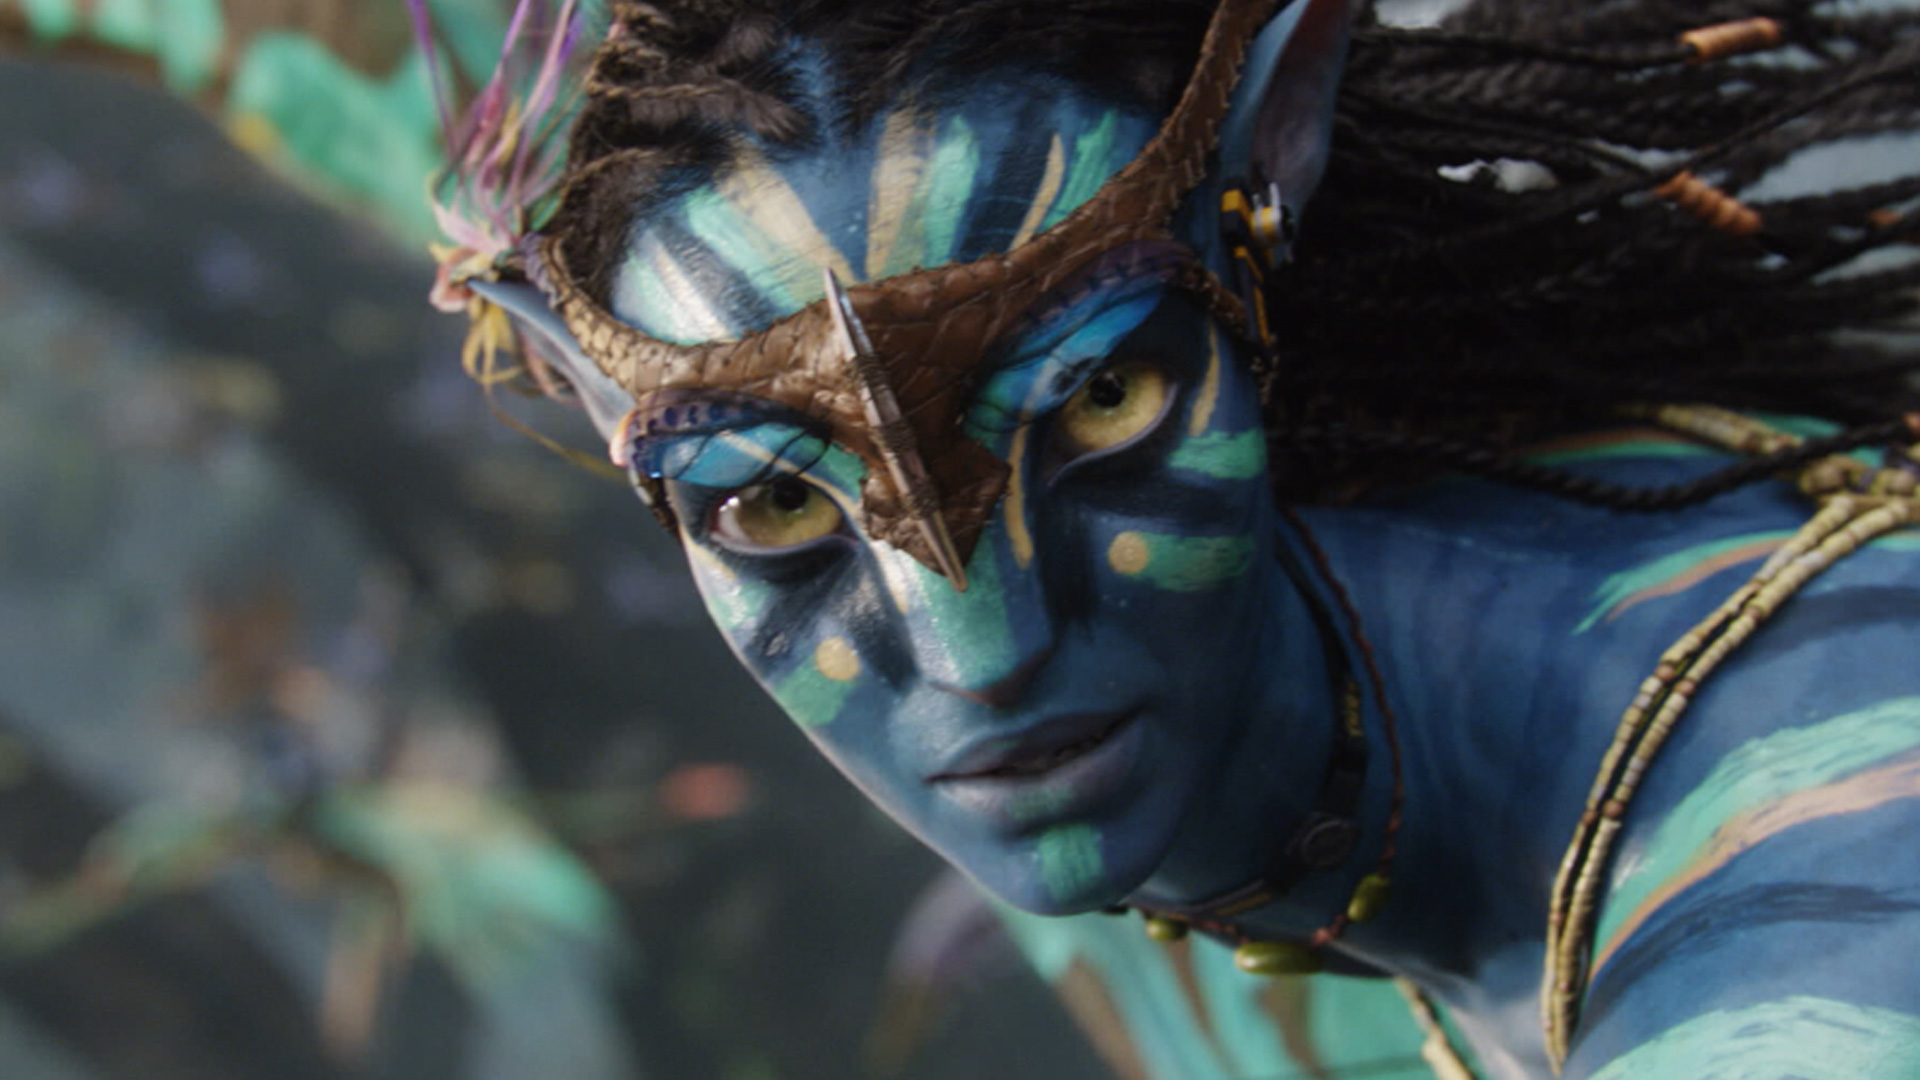 Киностудия FOX опровергла слухи о бюджете фильма Аватар. 24.11.2009